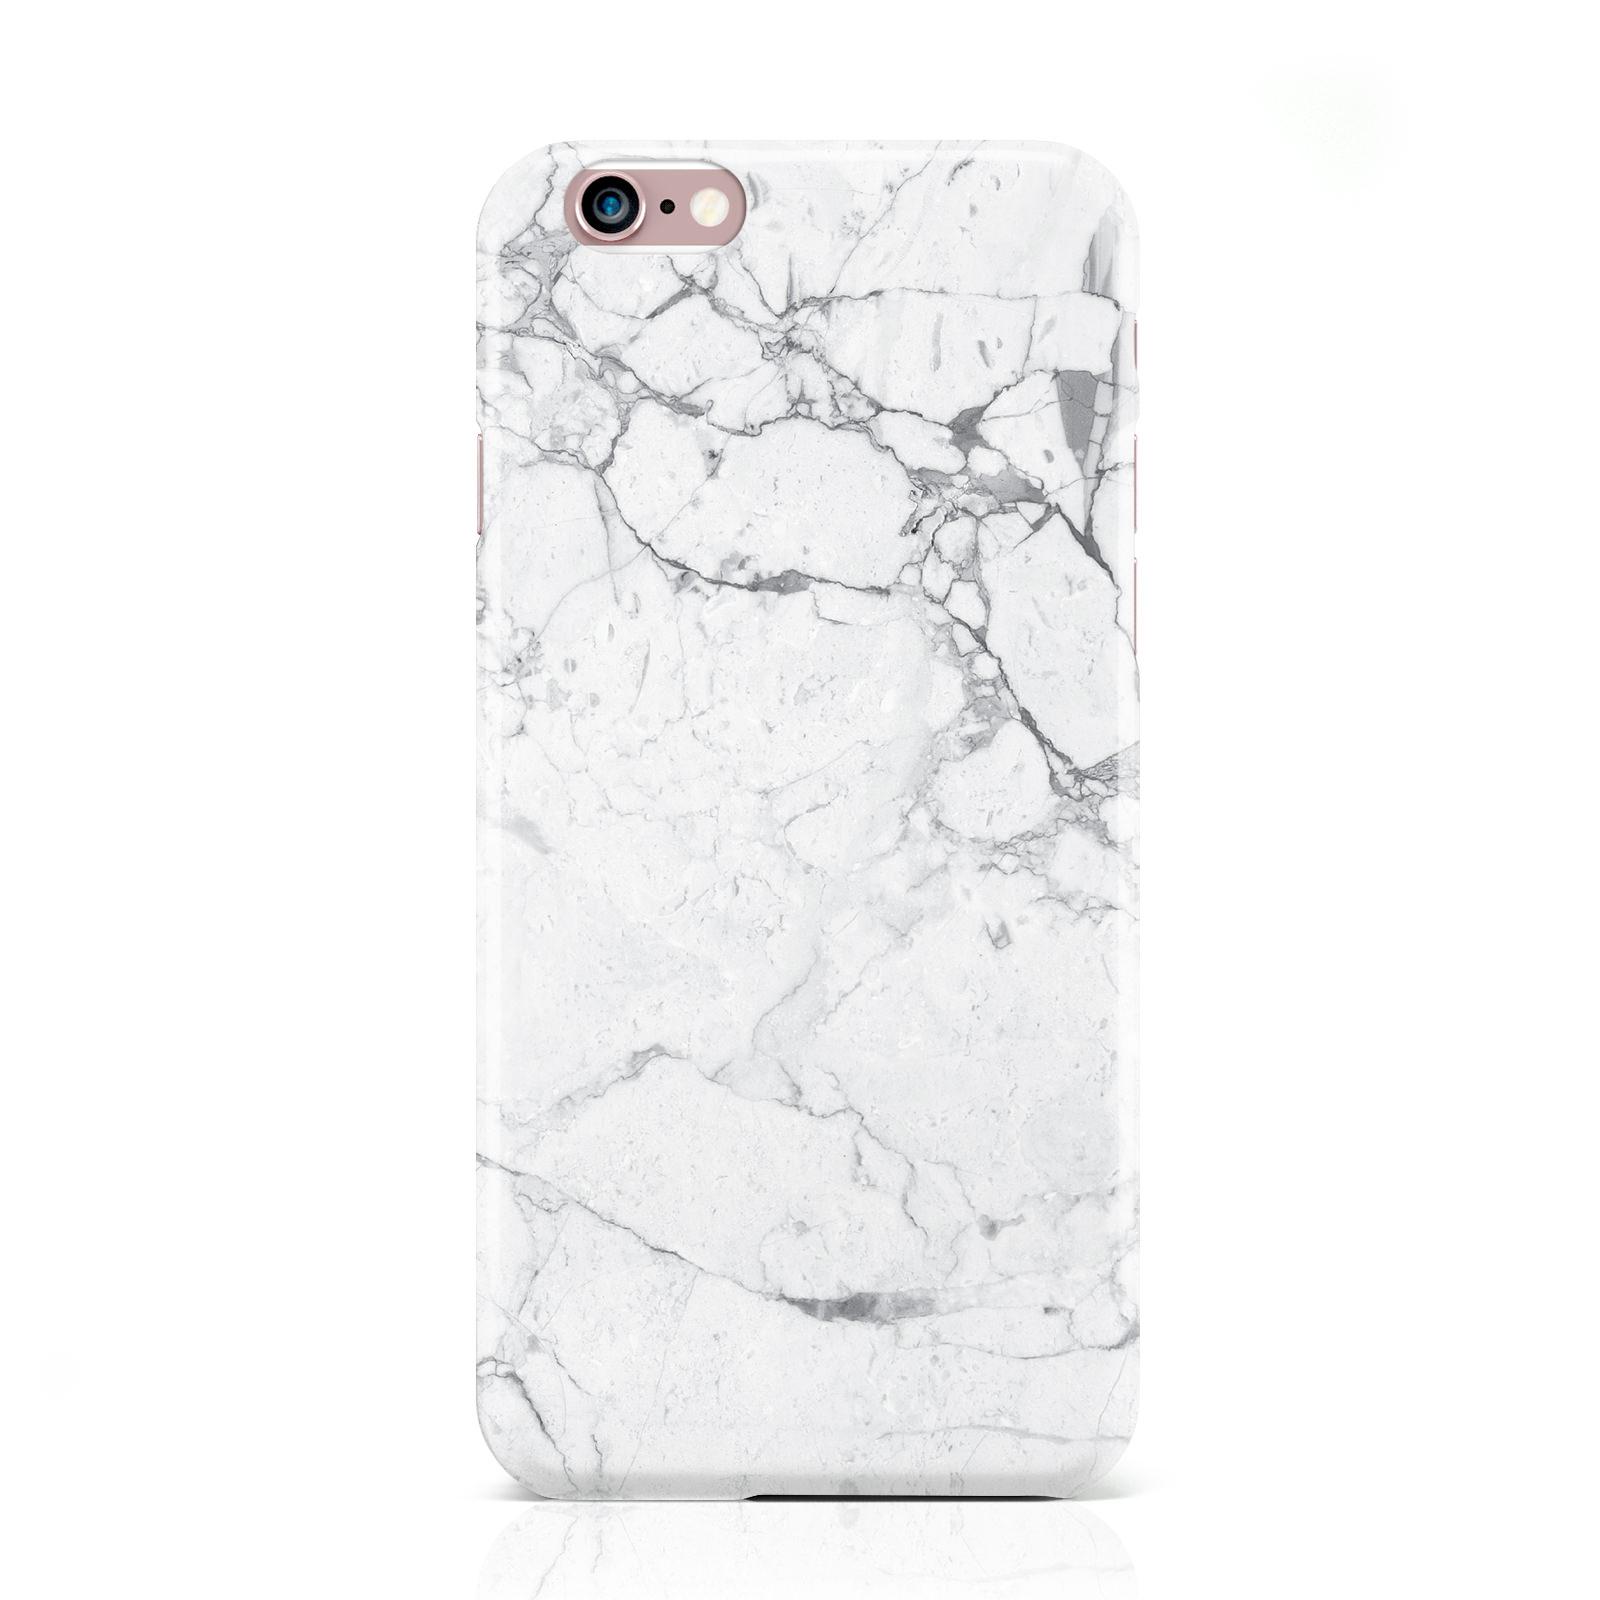 dyefor k nstlicher marmor effekt auswahl schwer h lle cover f r apple iphone ebay. Black Bedroom Furniture Sets. Home Design Ideas